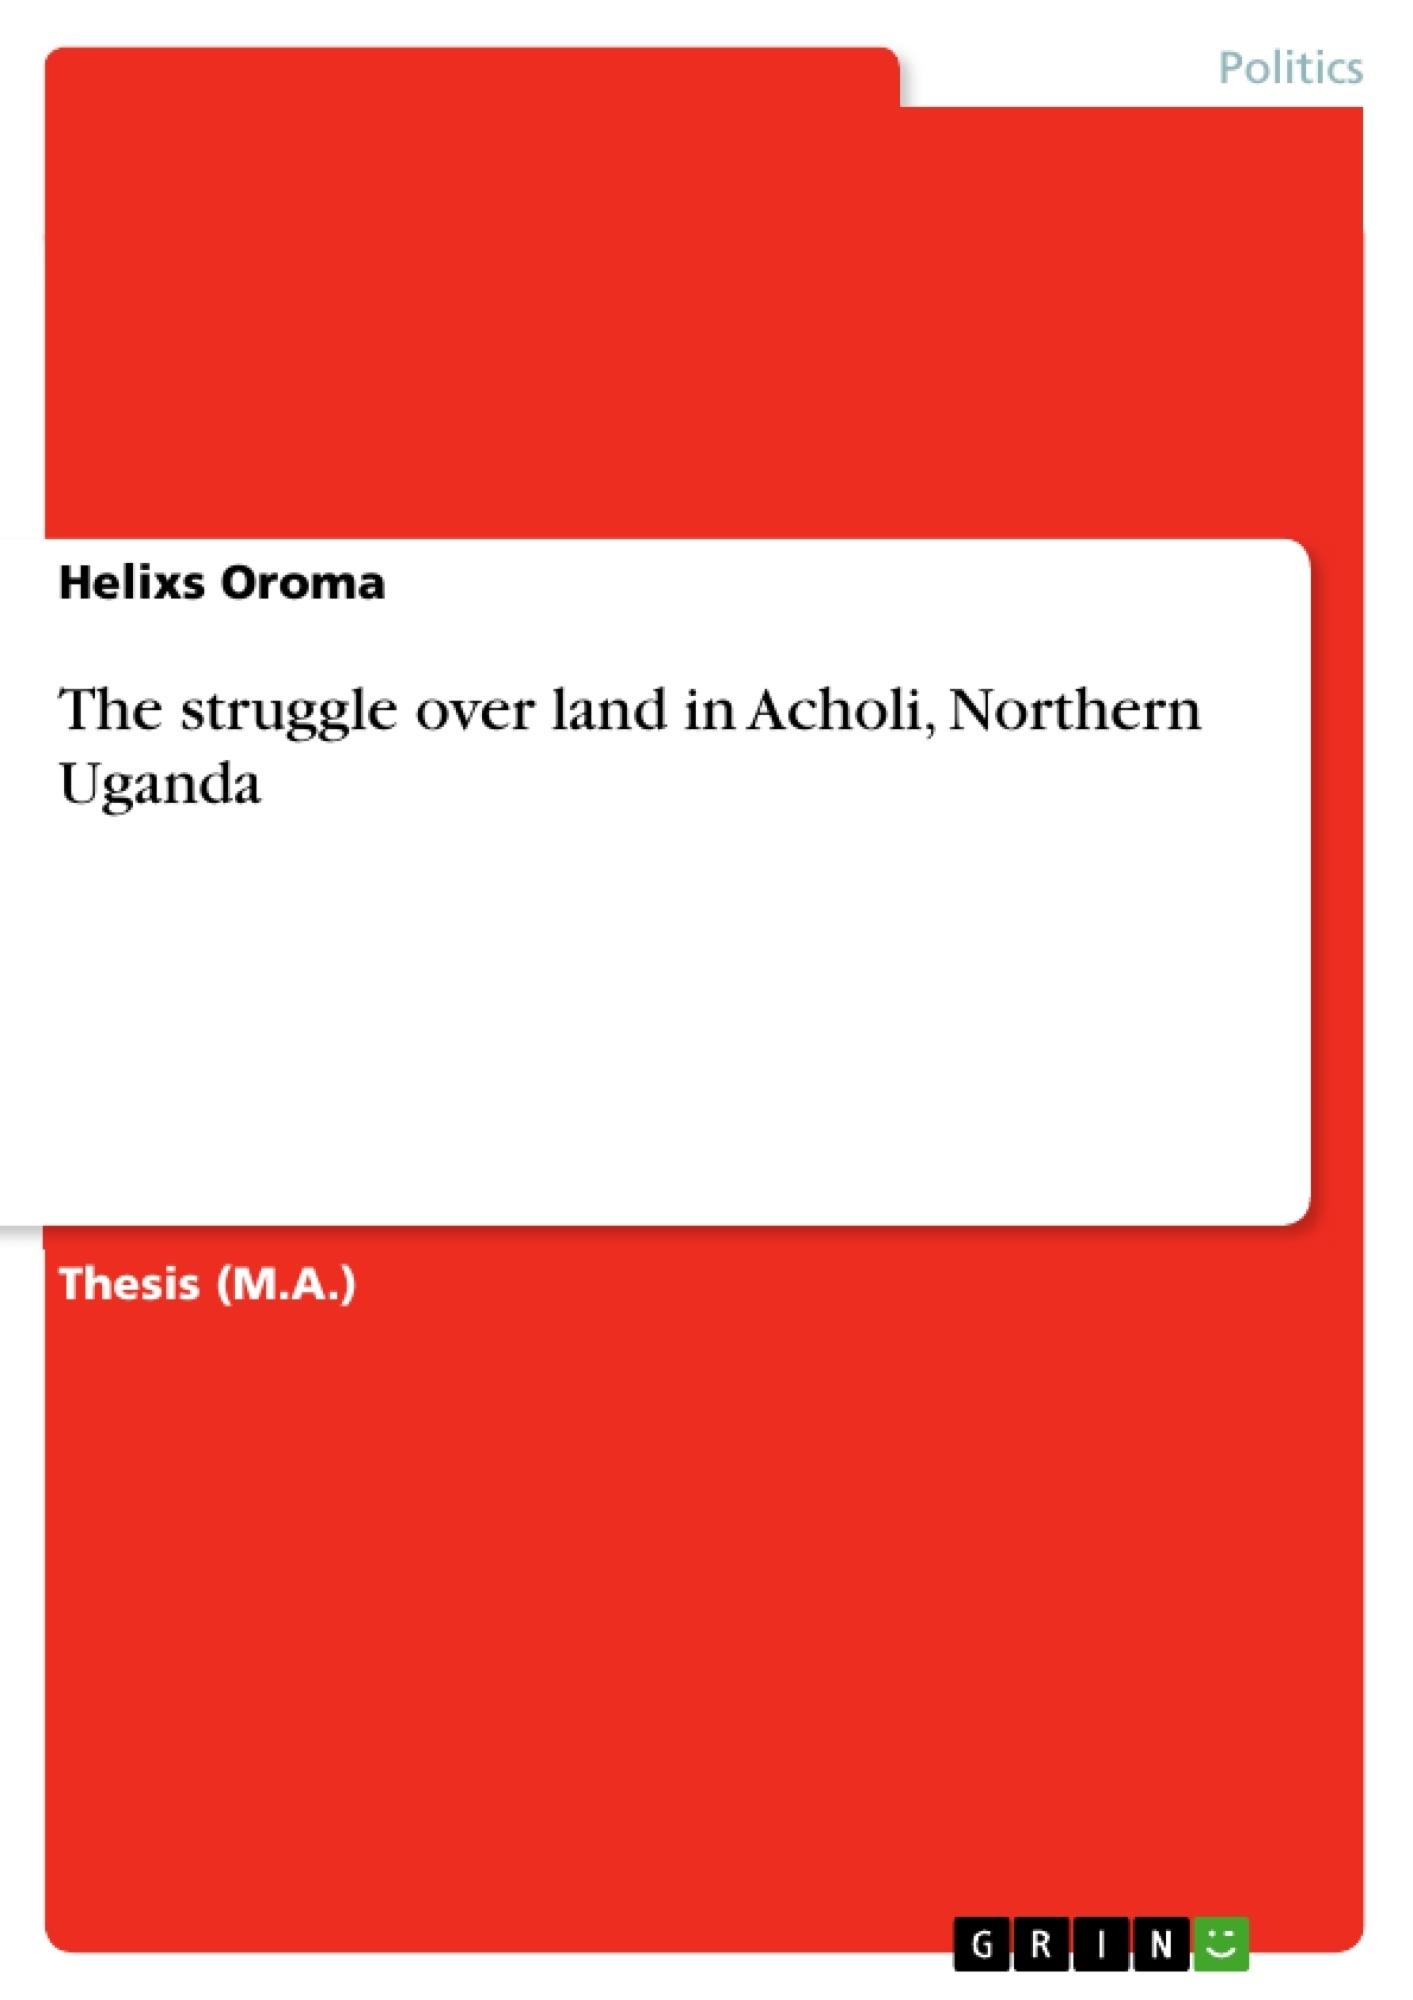 Title: The struggle over land in Acholi, Northern Uganda